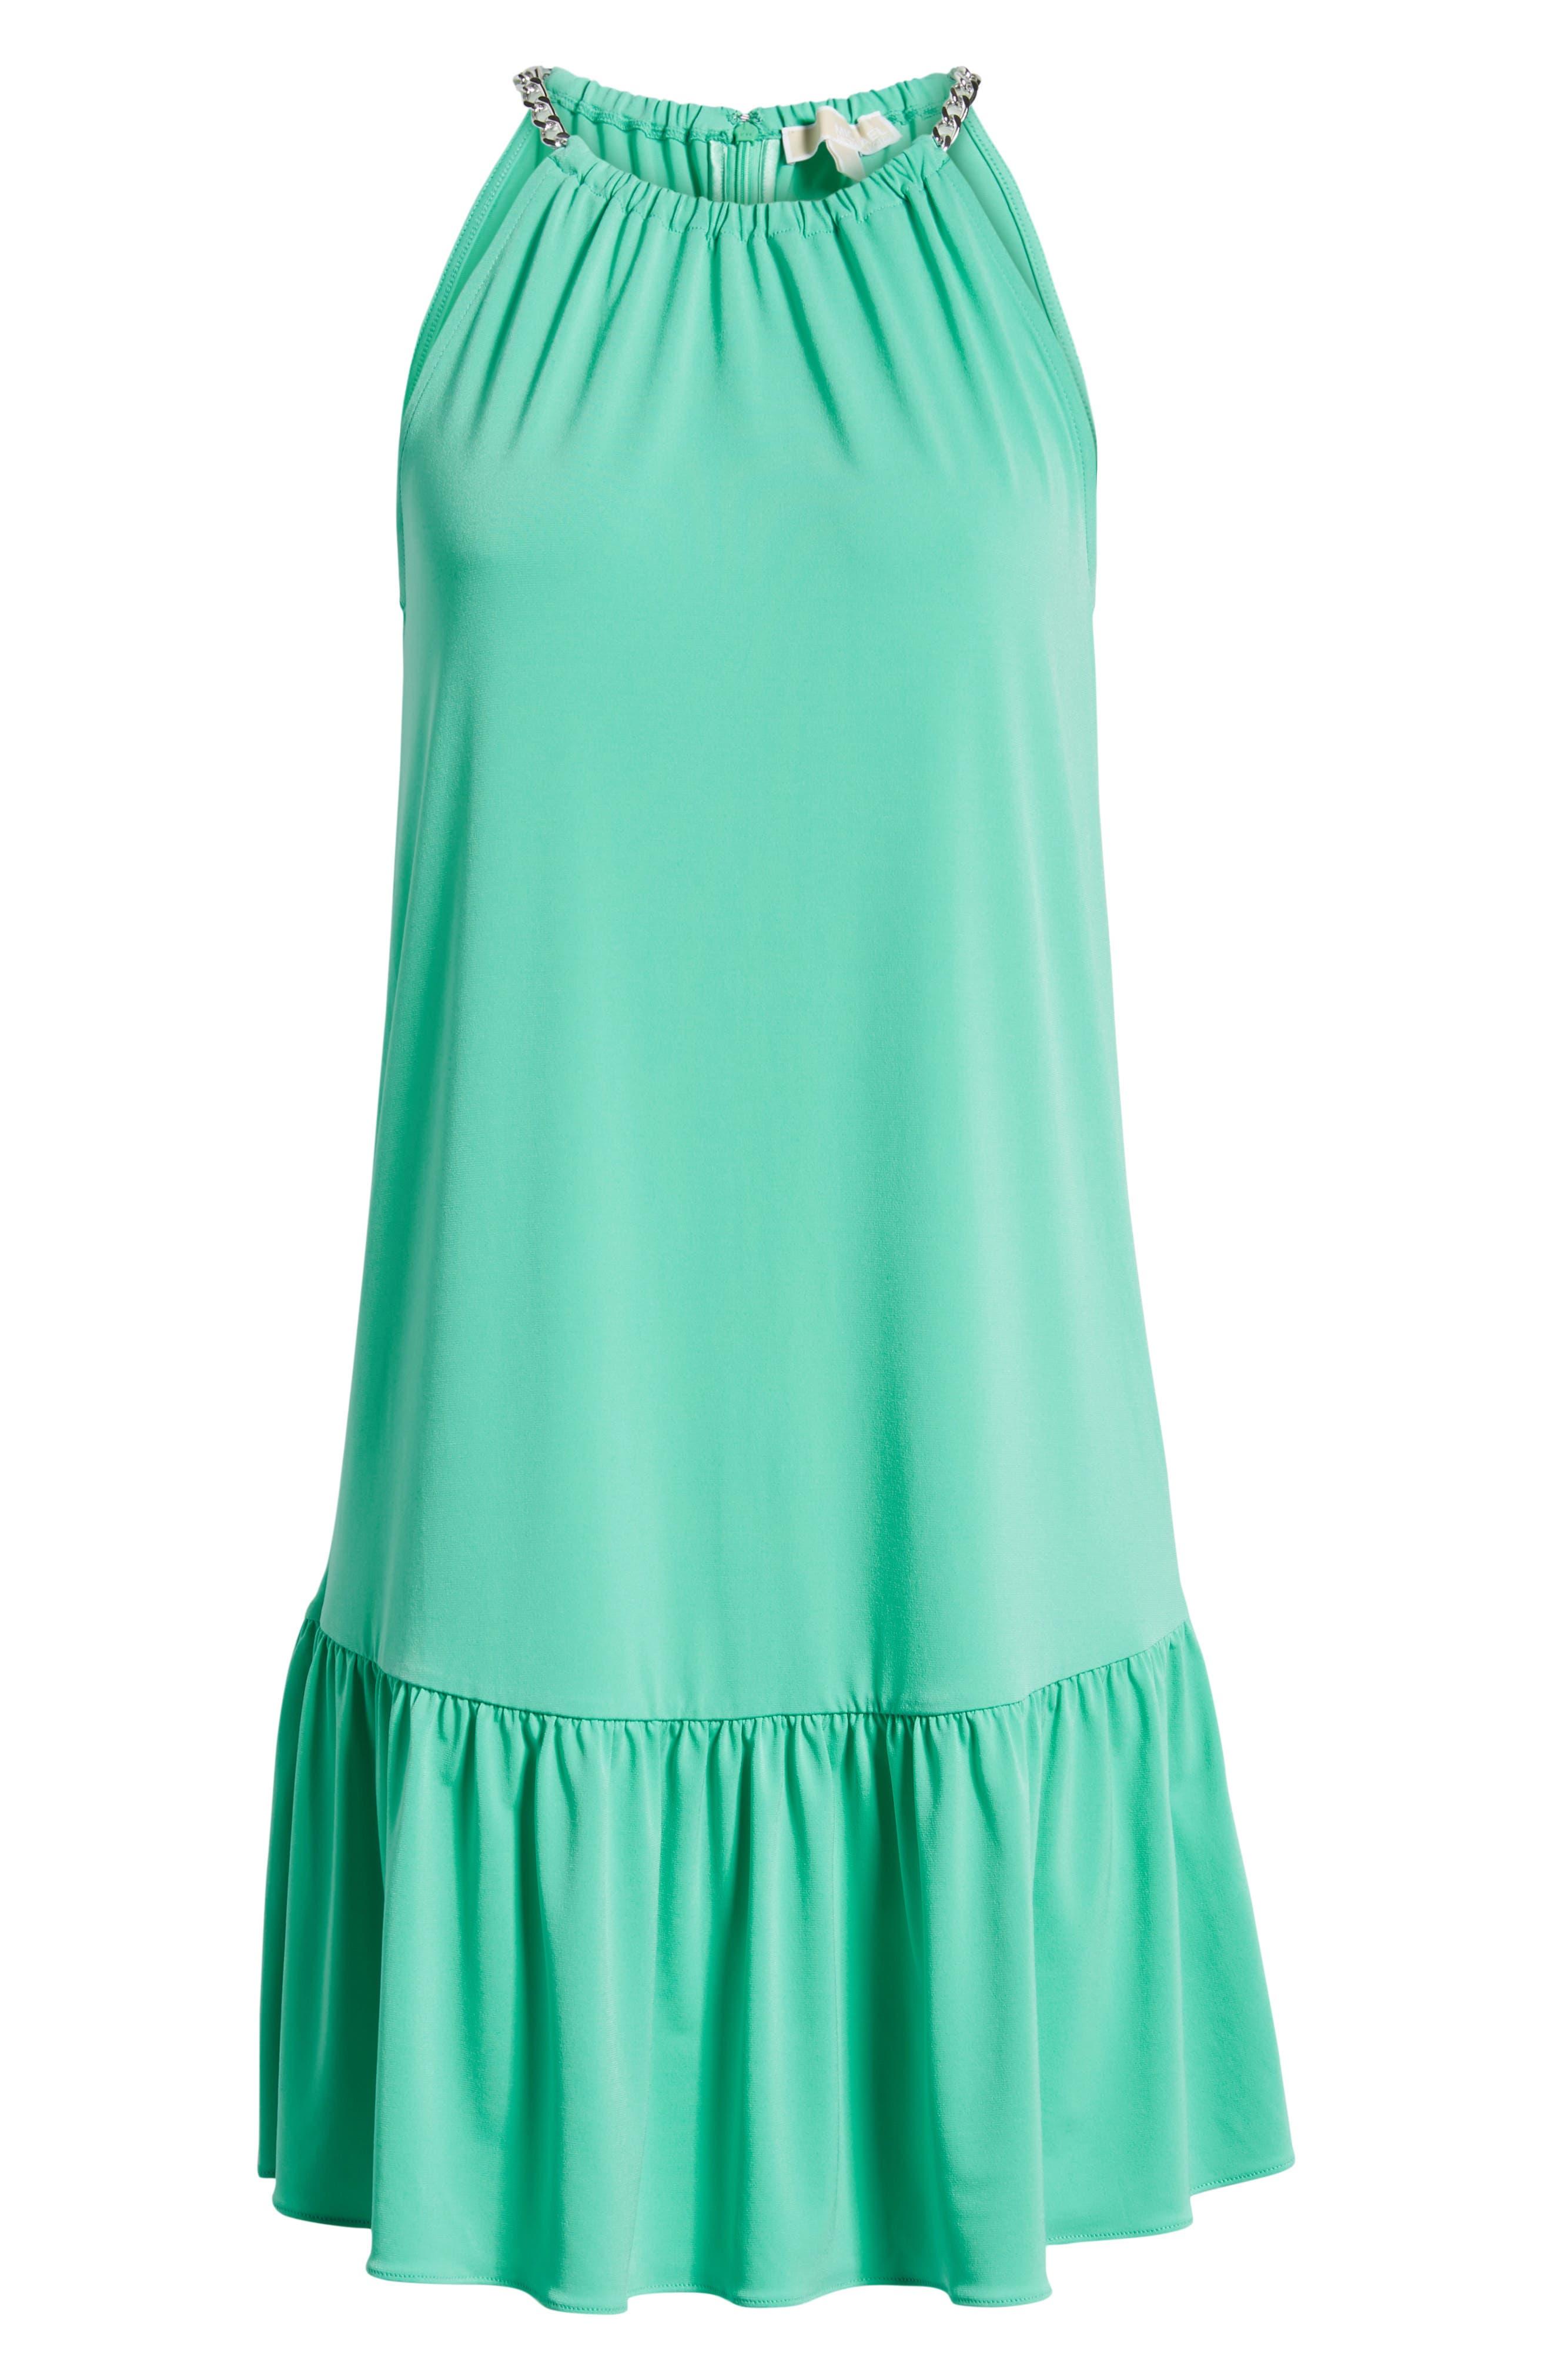 Chain Detail Halter Dress,                             Alternate thumbnail 8, color,                             300